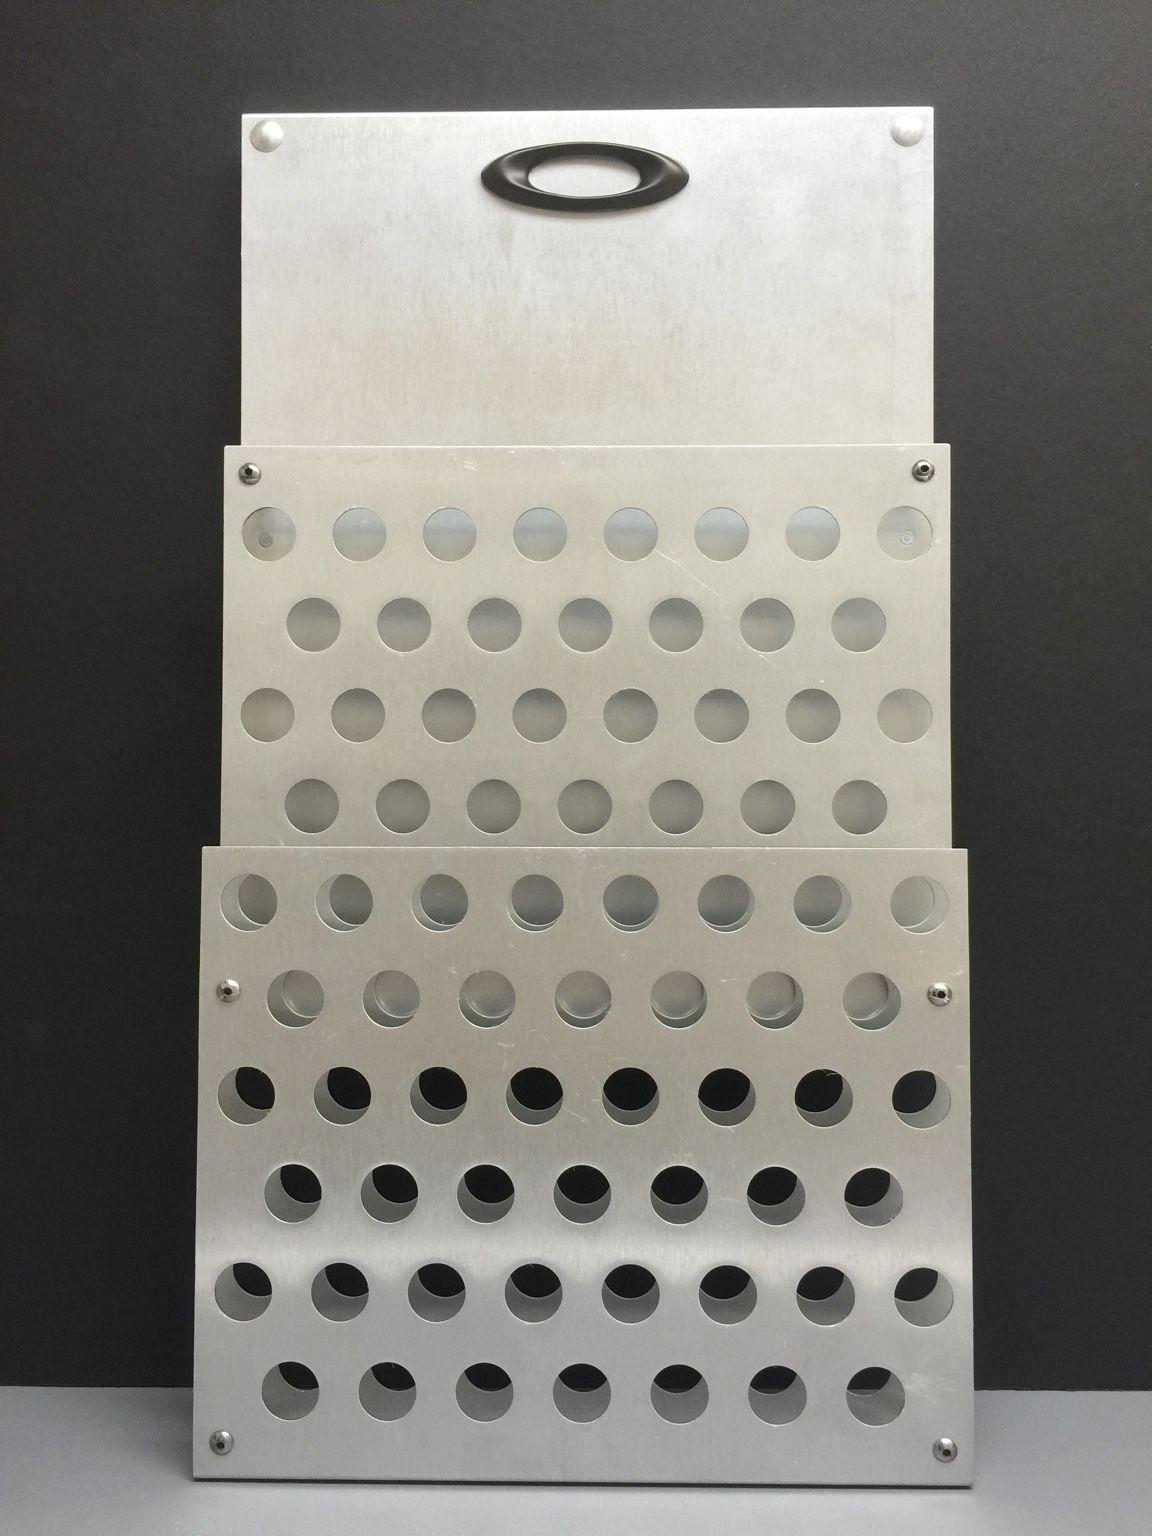 X Metal Tower Literature Rack - 414130f3f2e0a0b62e6a8596908dff1d.jpg